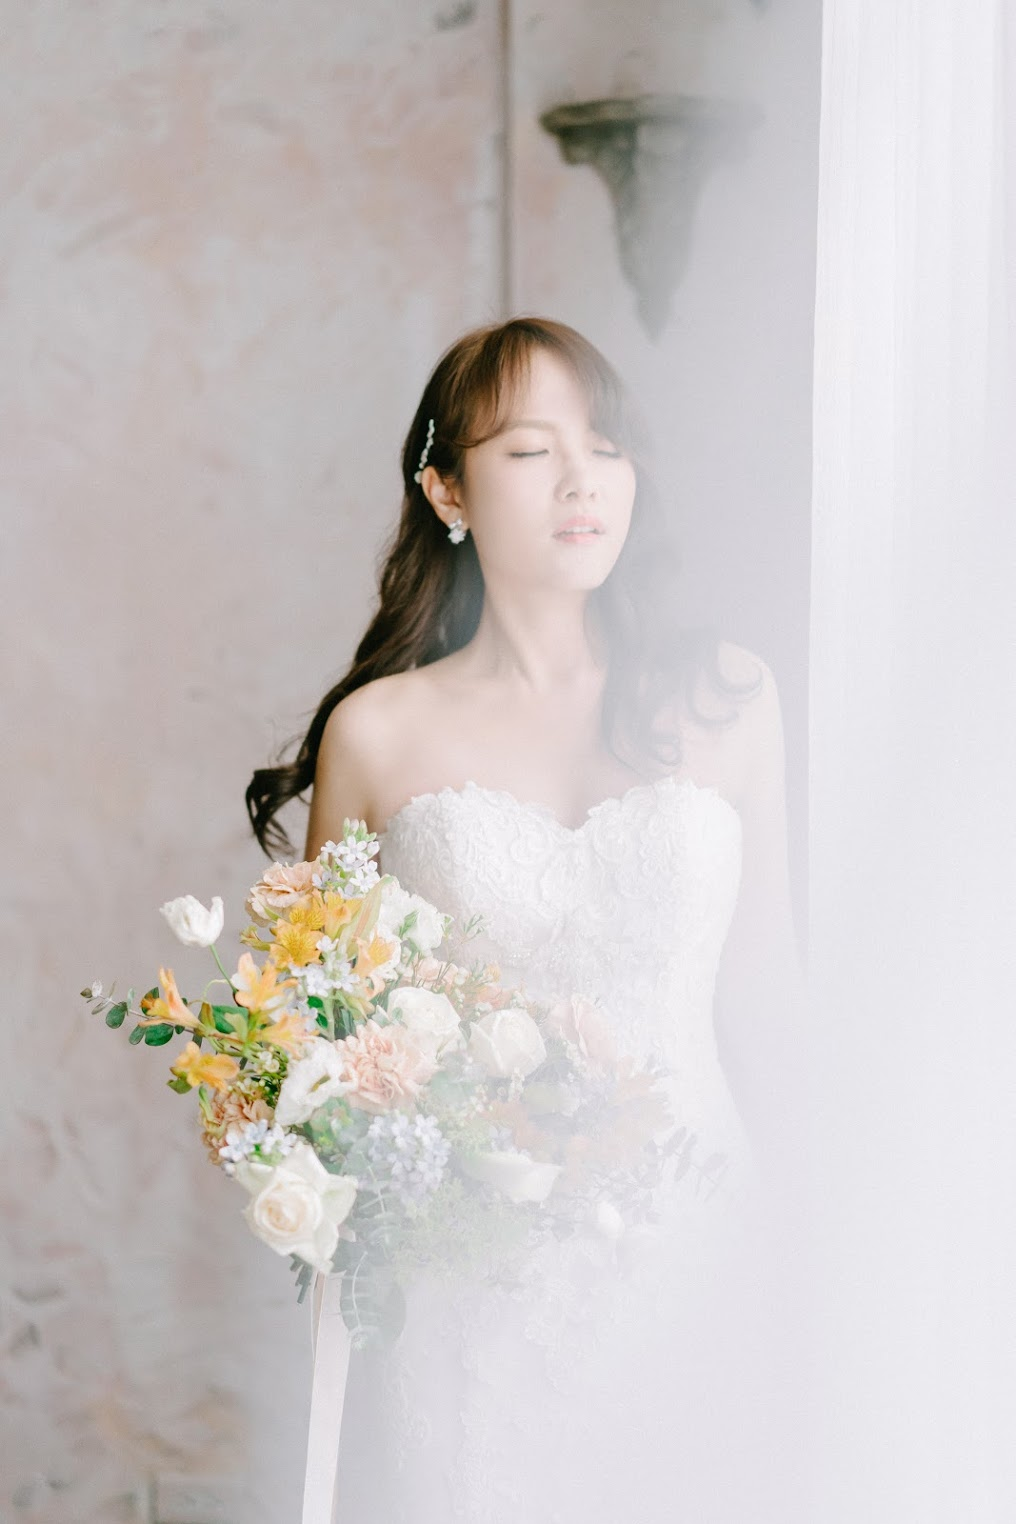 undefinedAG婚紗,美式婚紗,Amazing Geace攝影,逐光婚紗-Fine art 婚紗 -美式婚紗婚禮 -台中自助婚紗,engagement